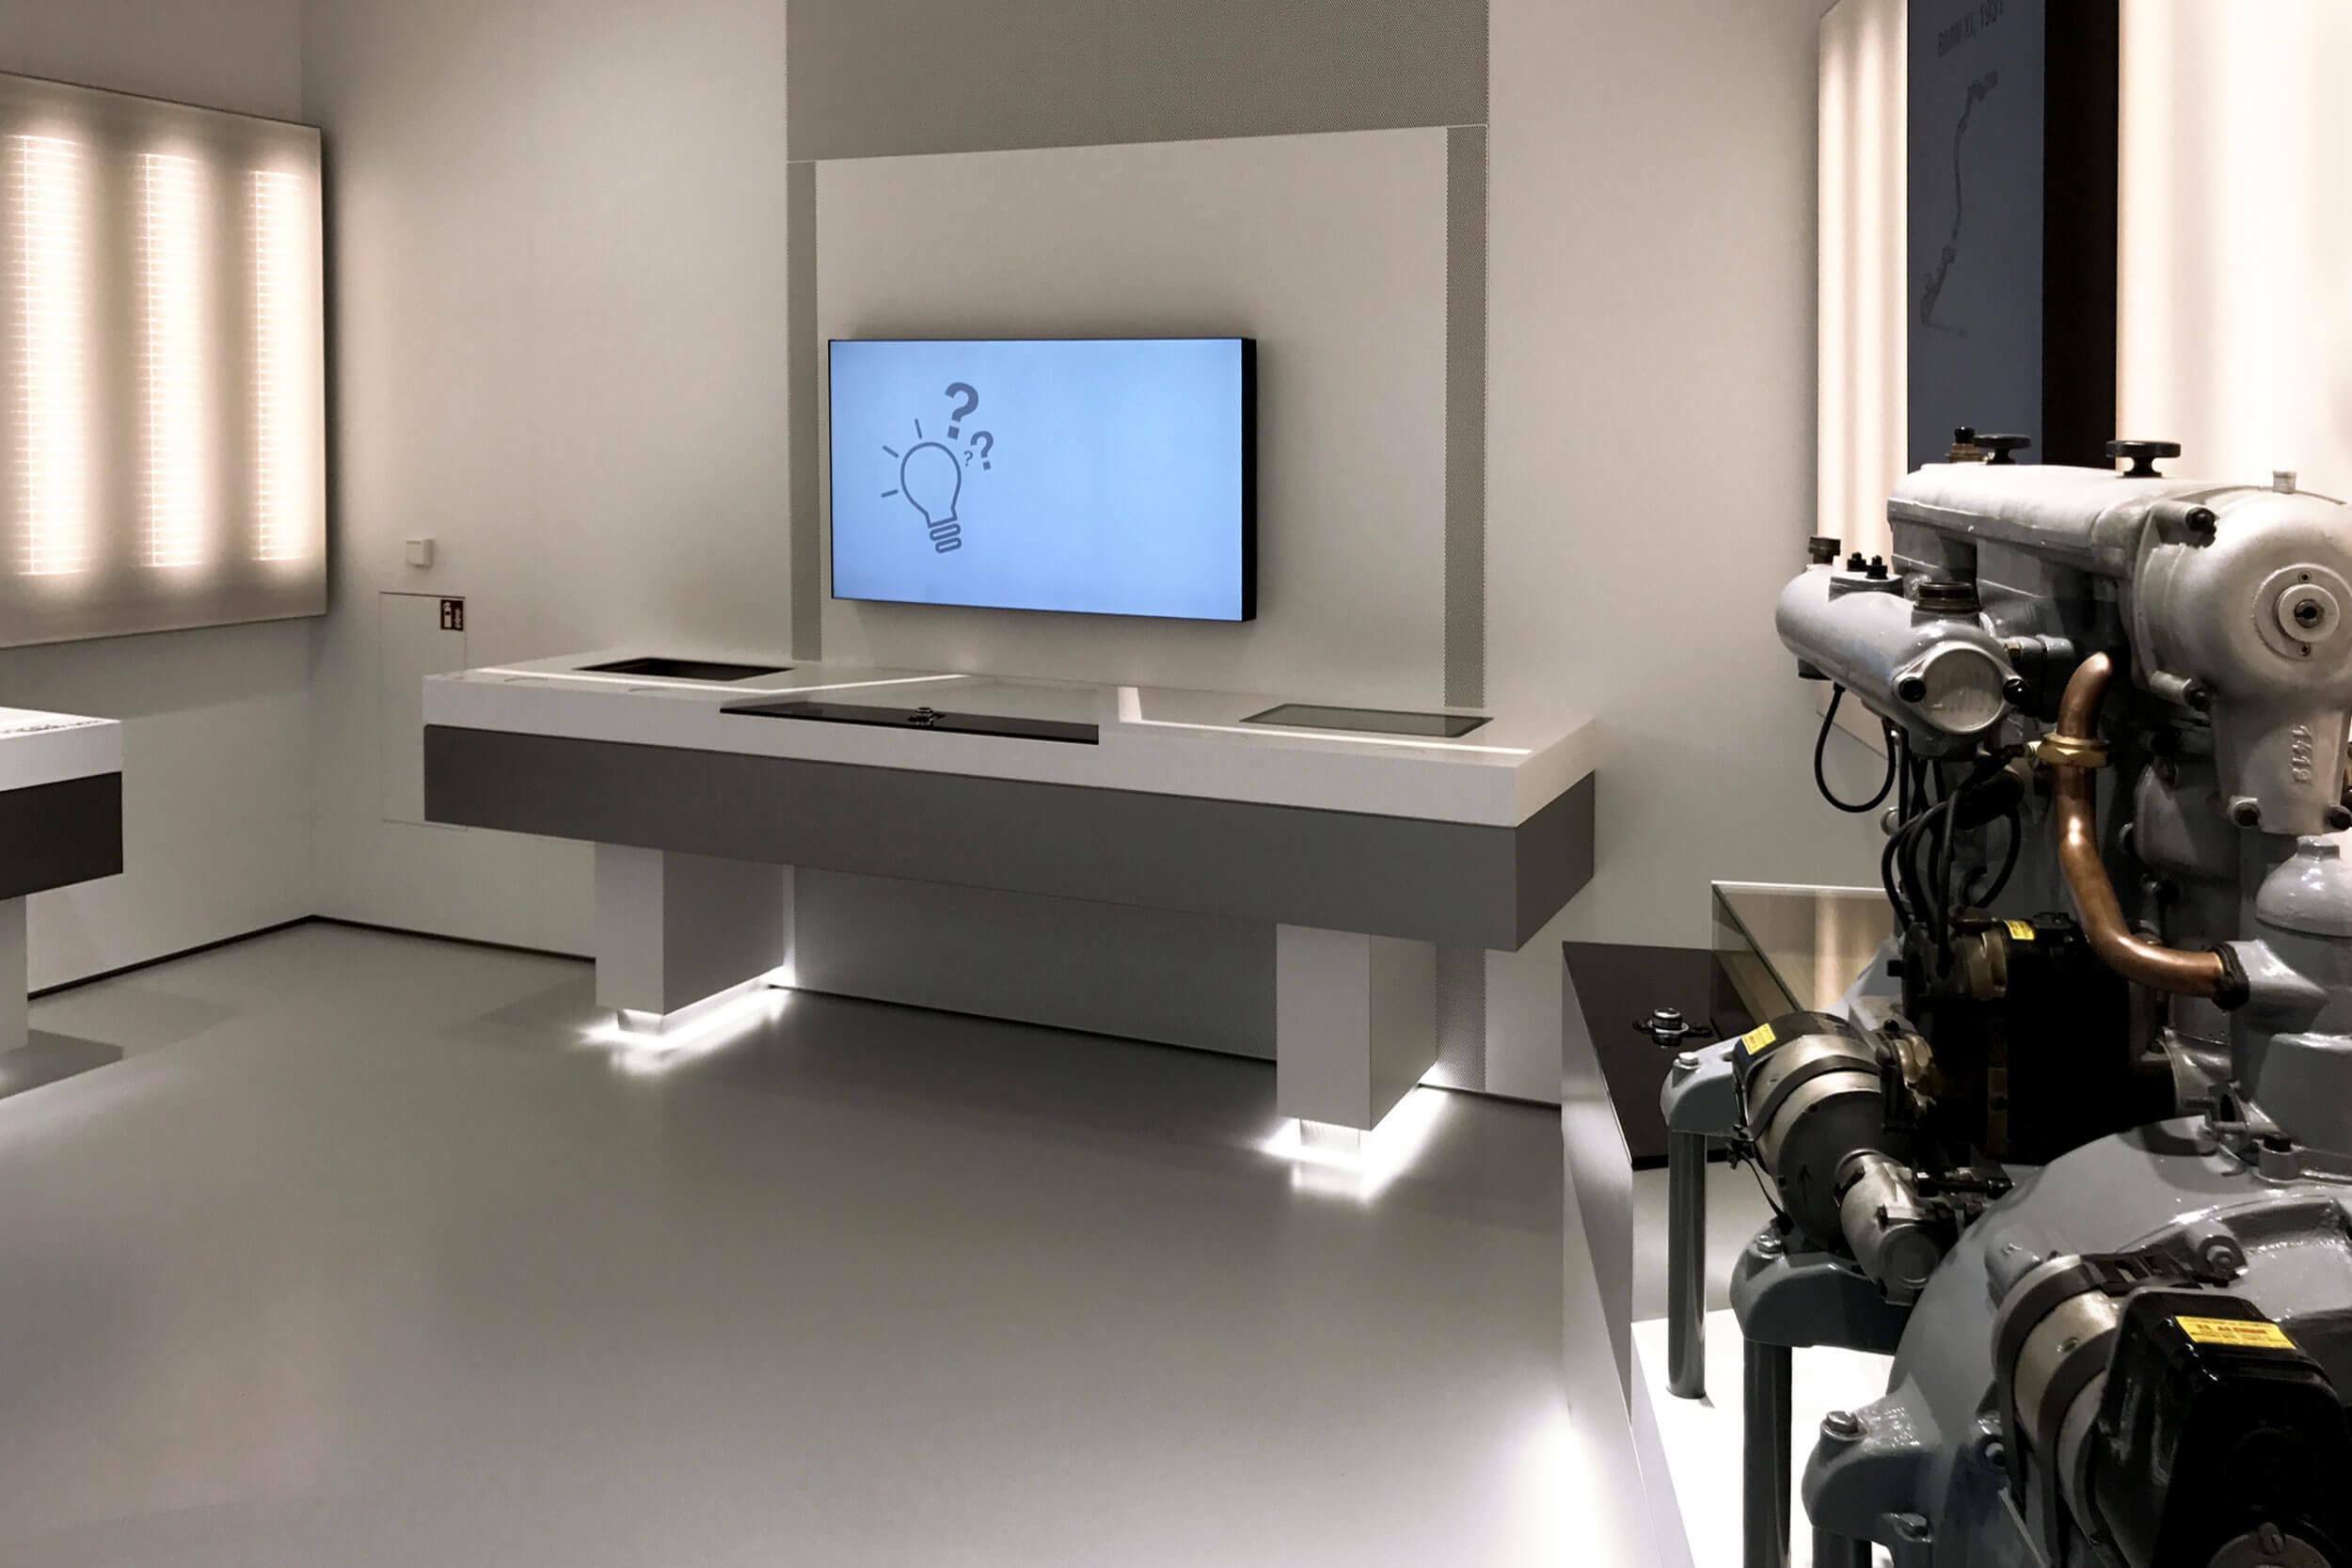 Multimediabereich des BMW Museums